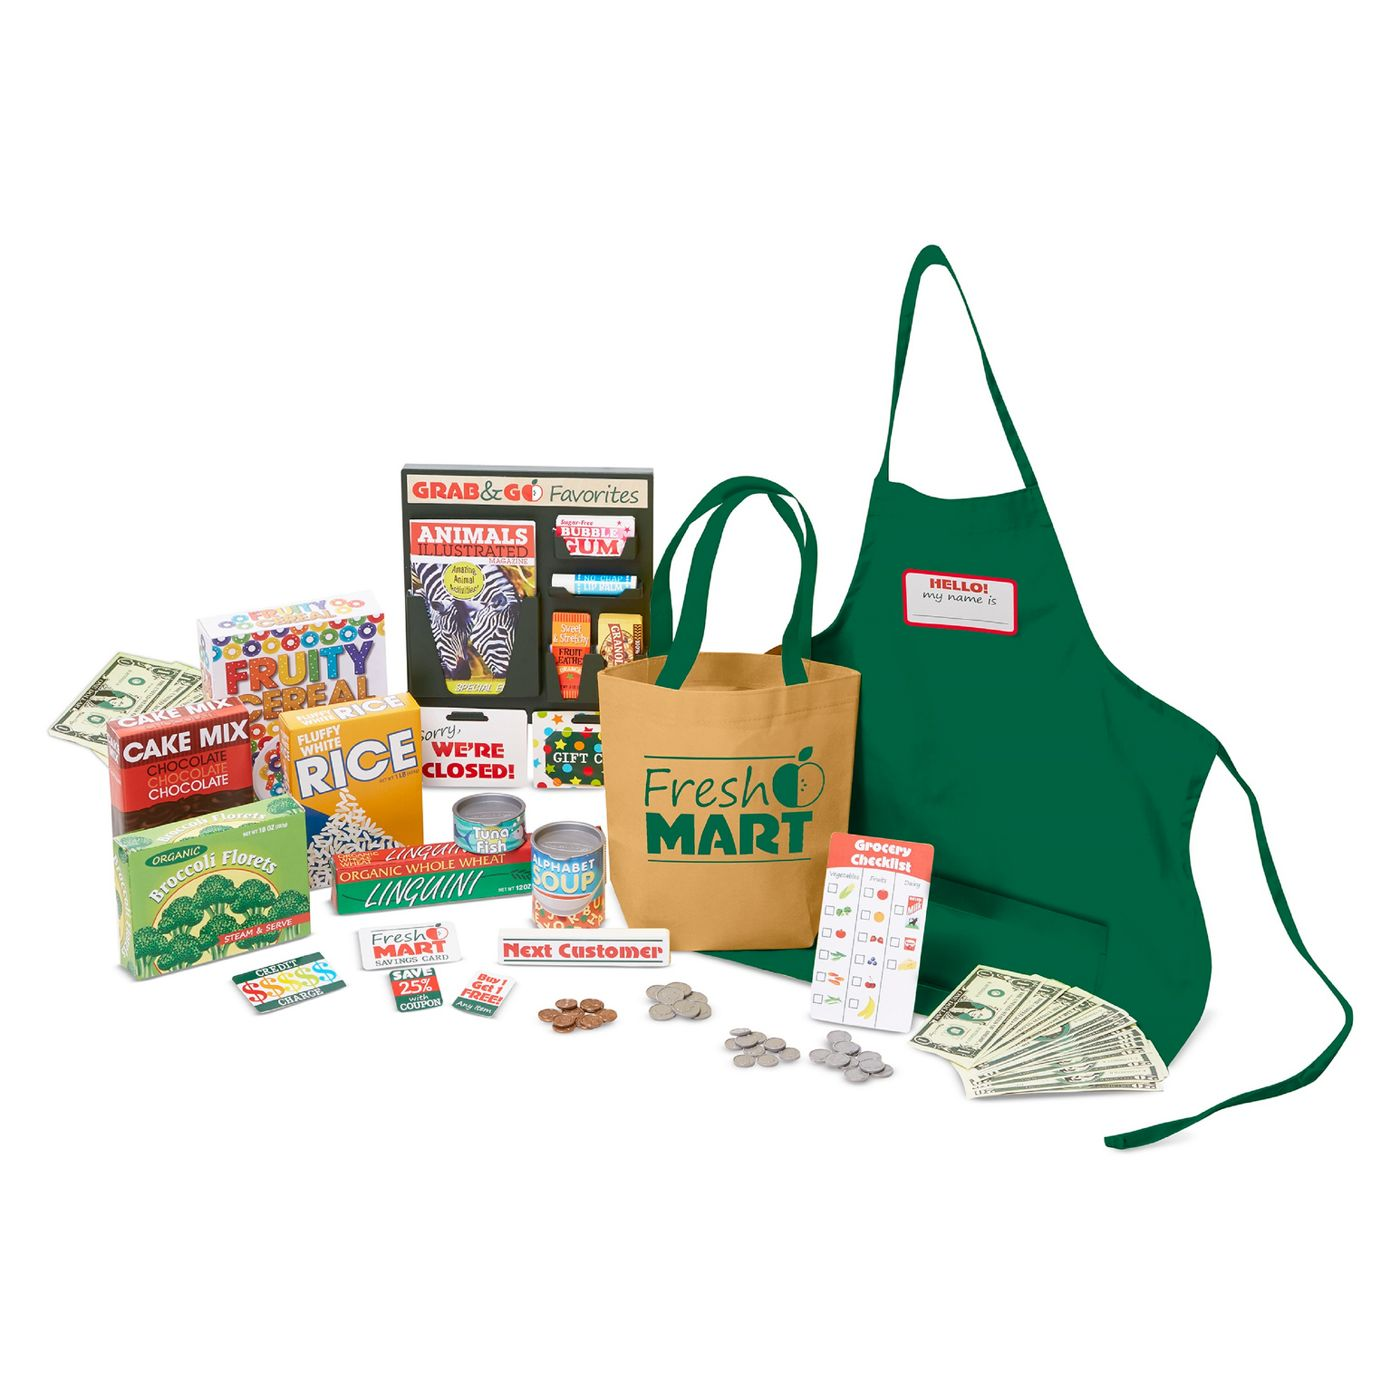 Melissa & Doug Fresh Mart Grocery Store Companion Collection - image 1 of 6